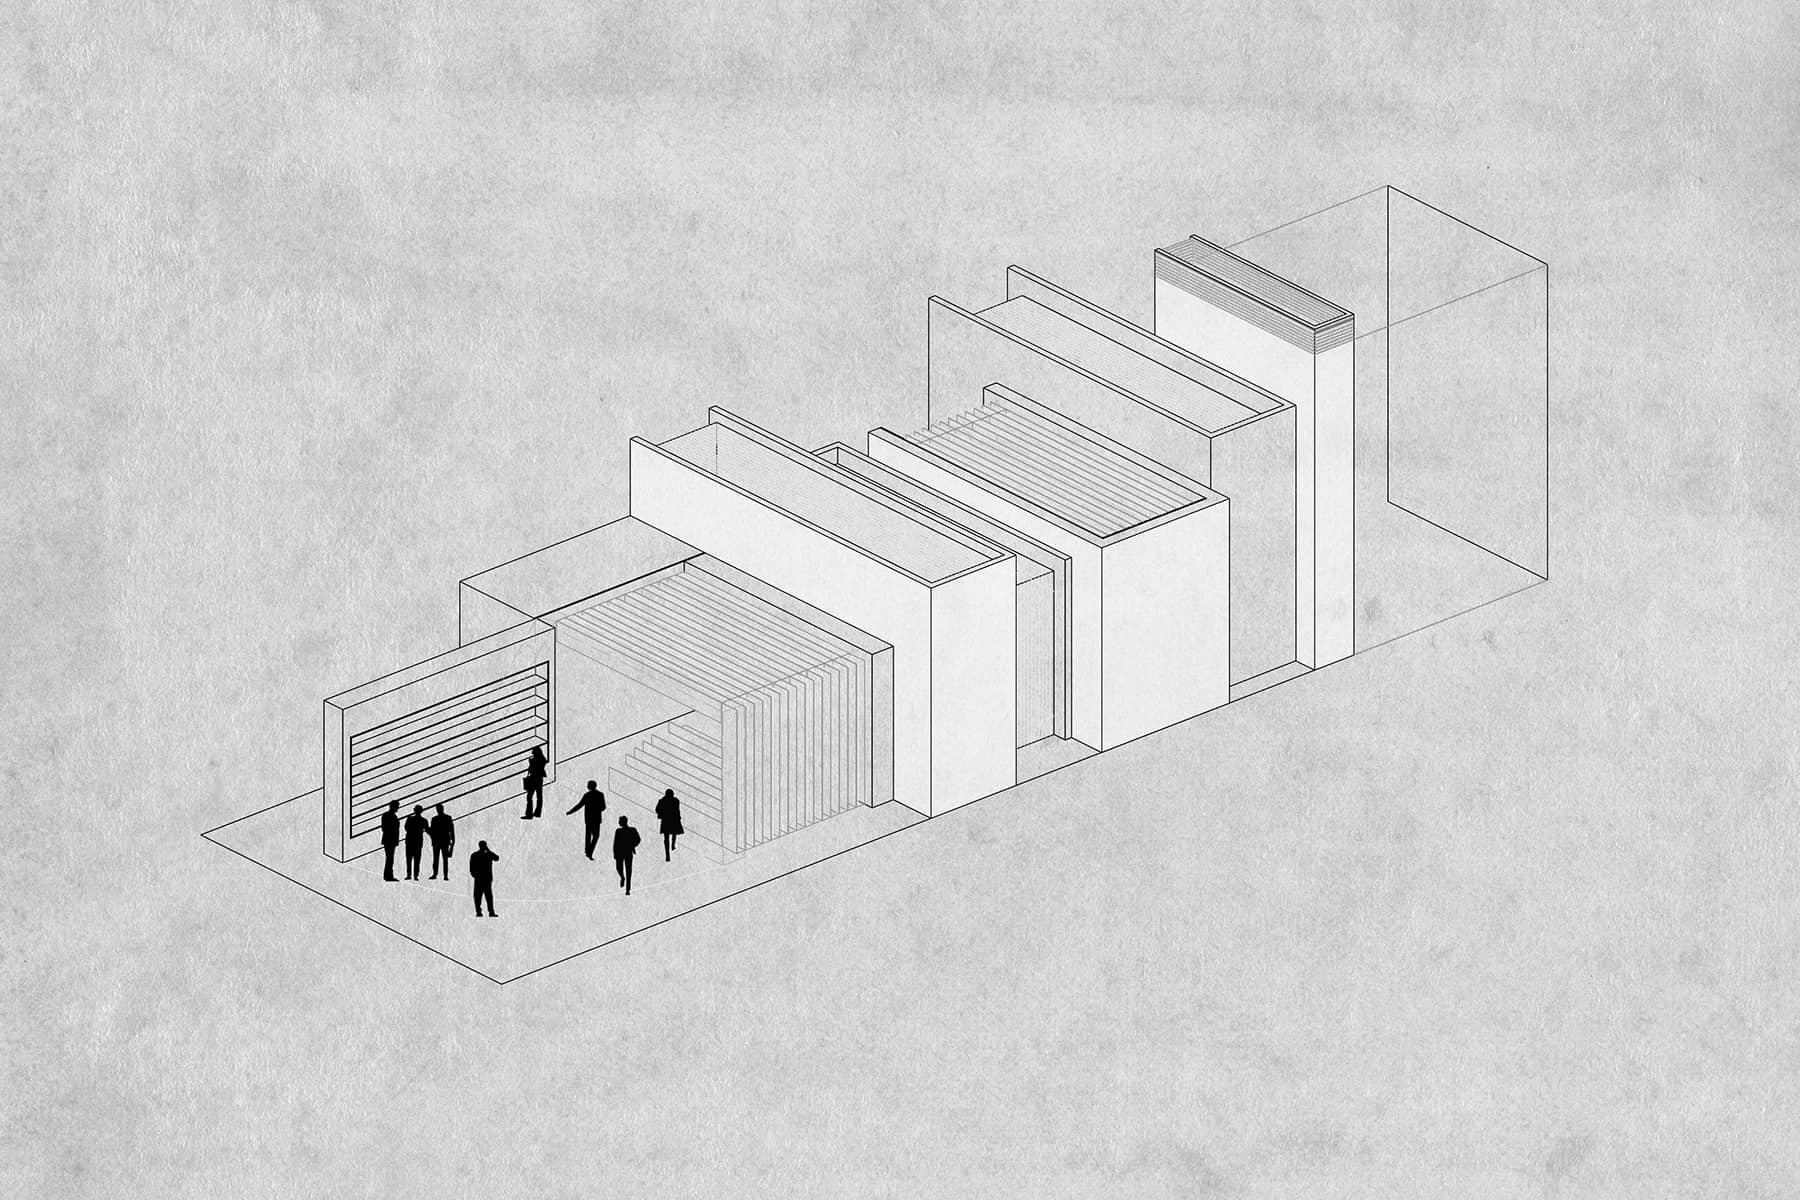 alt=concepto del pabellón institucional feria del libro